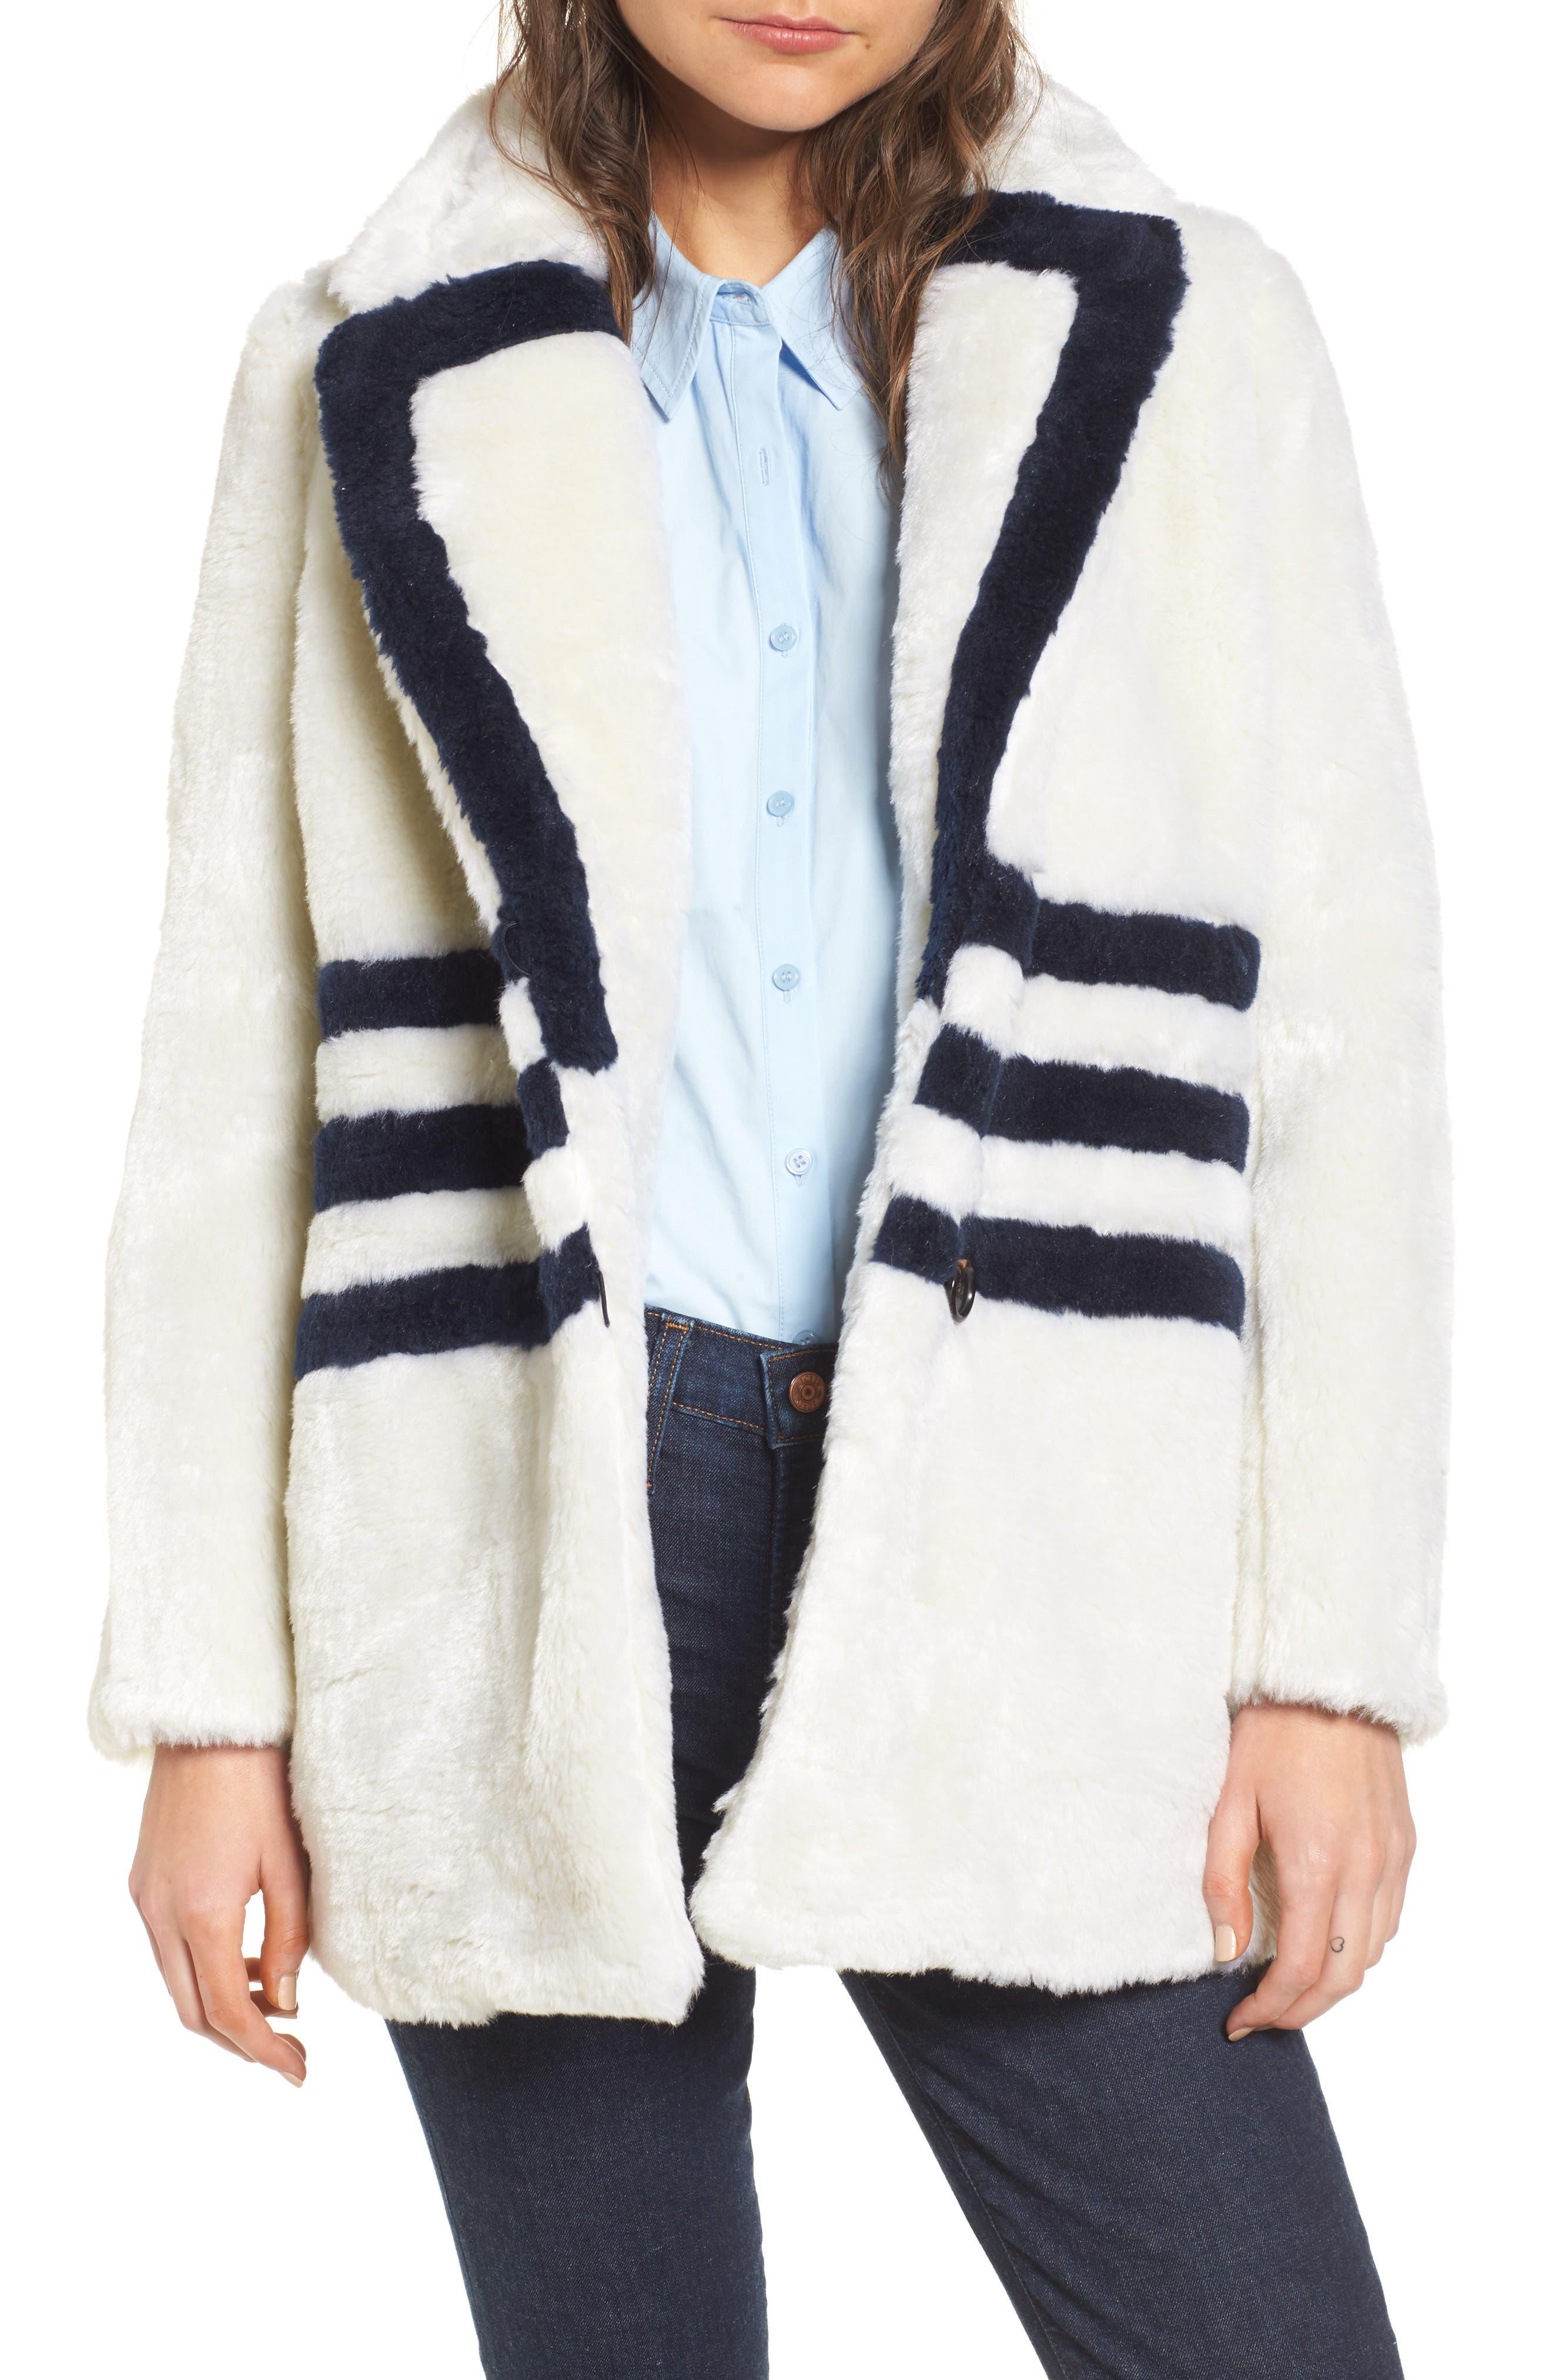 J.Crew Yuna Teddy Faux Fur Jacket,                         Main,                         color, Ivory/ Navy